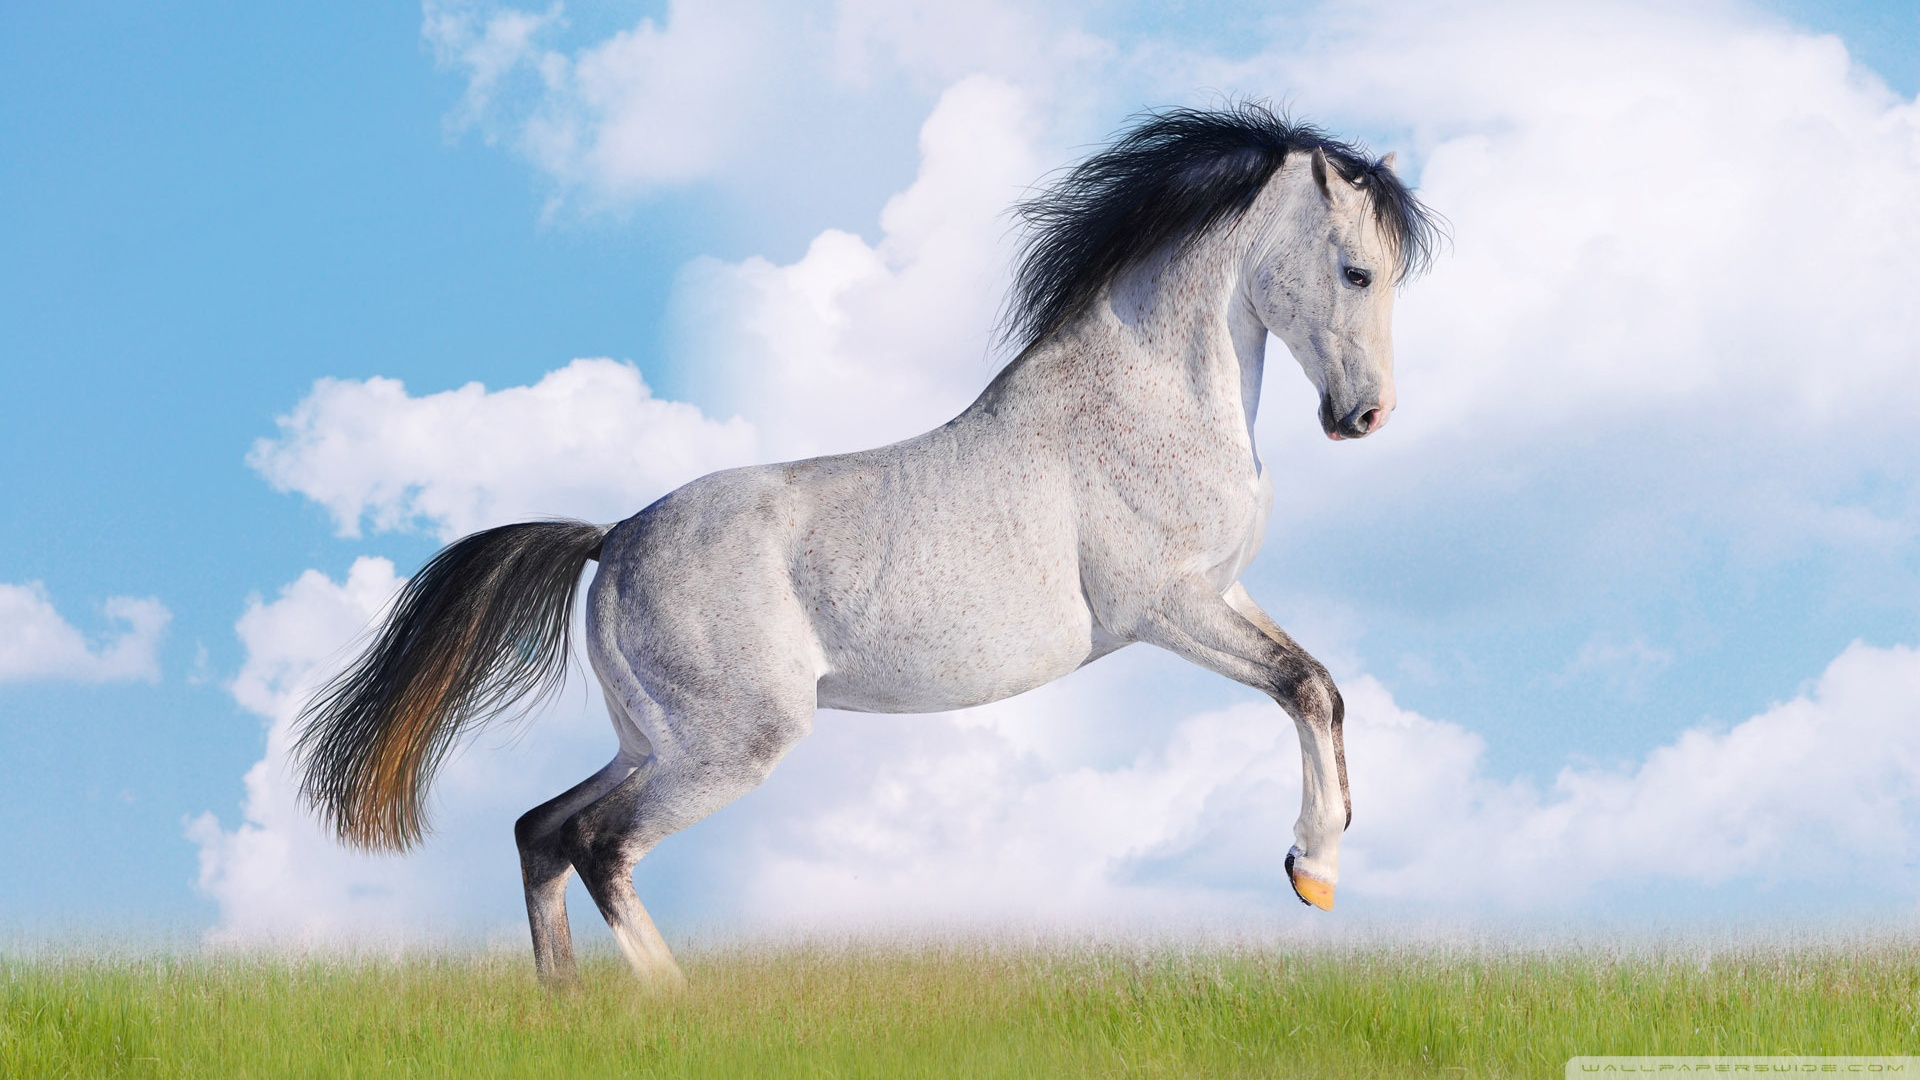 Free Download White Horse 4k Hd Desktop Wallpaper For 4k Ultra Hd